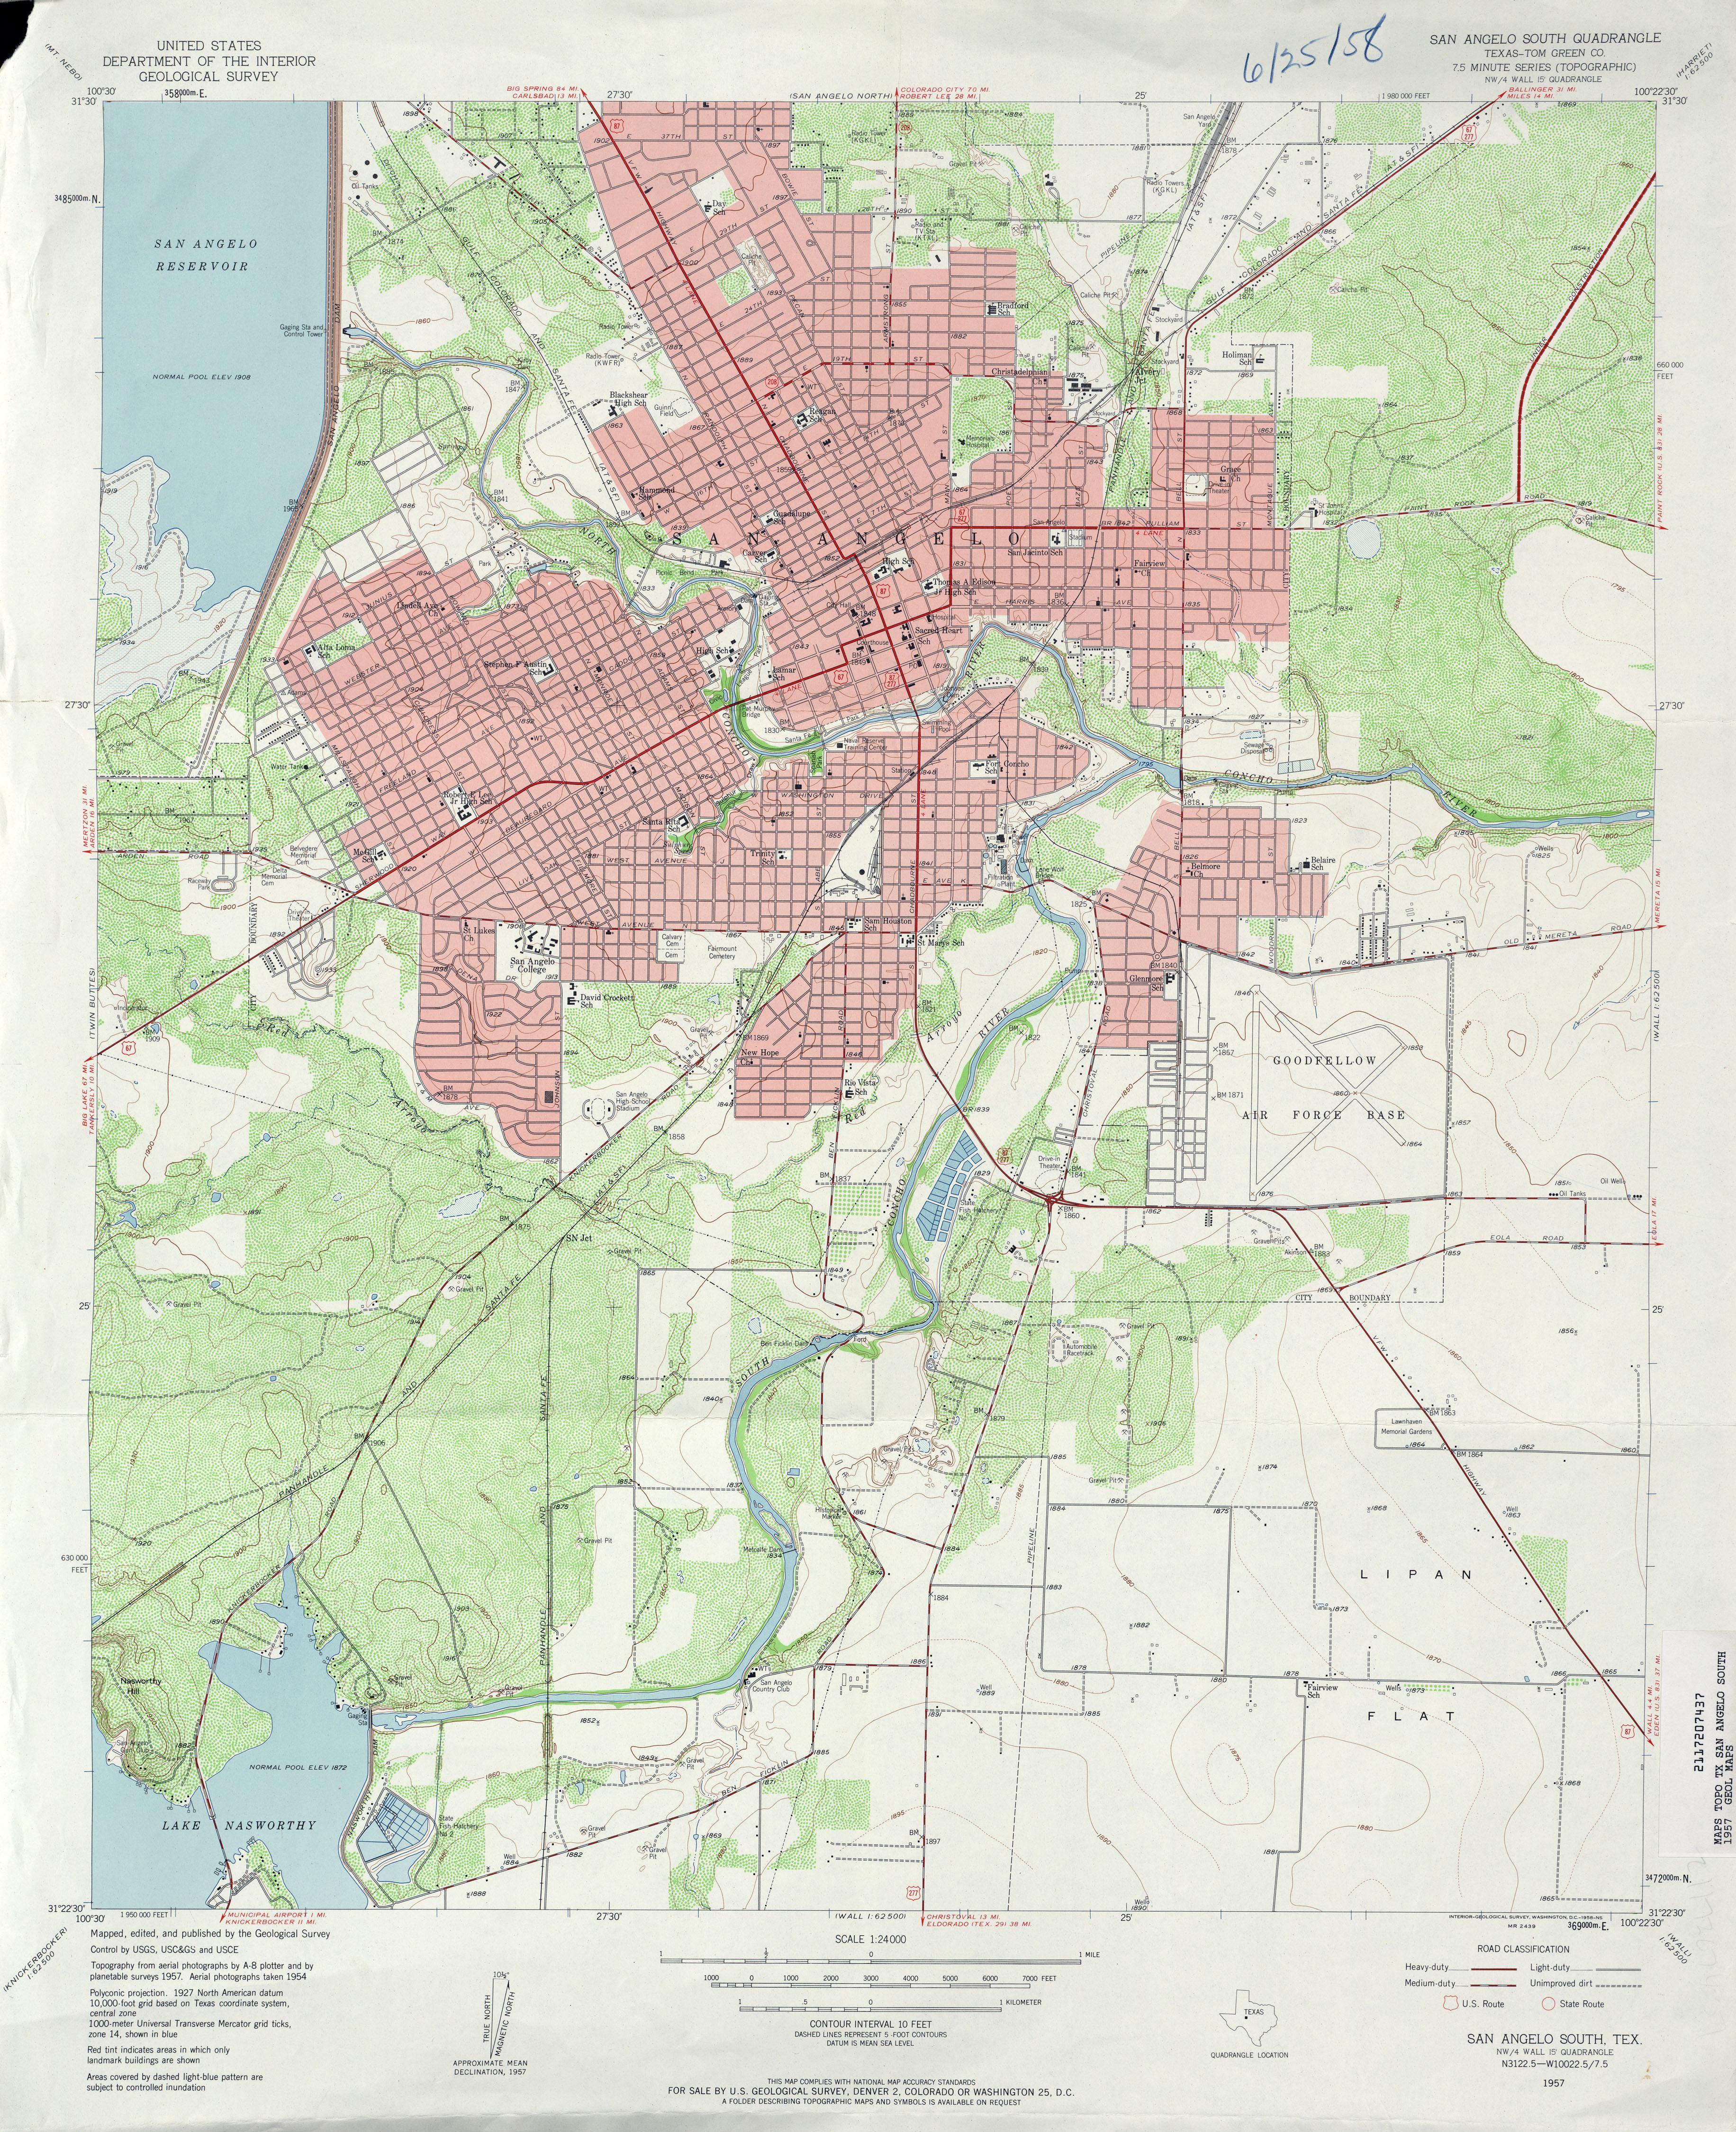 Texas Topographic Maps - Perry-Castañeda Map Collection - UT ... on map austin houston, map austin texas, map austin round rock,